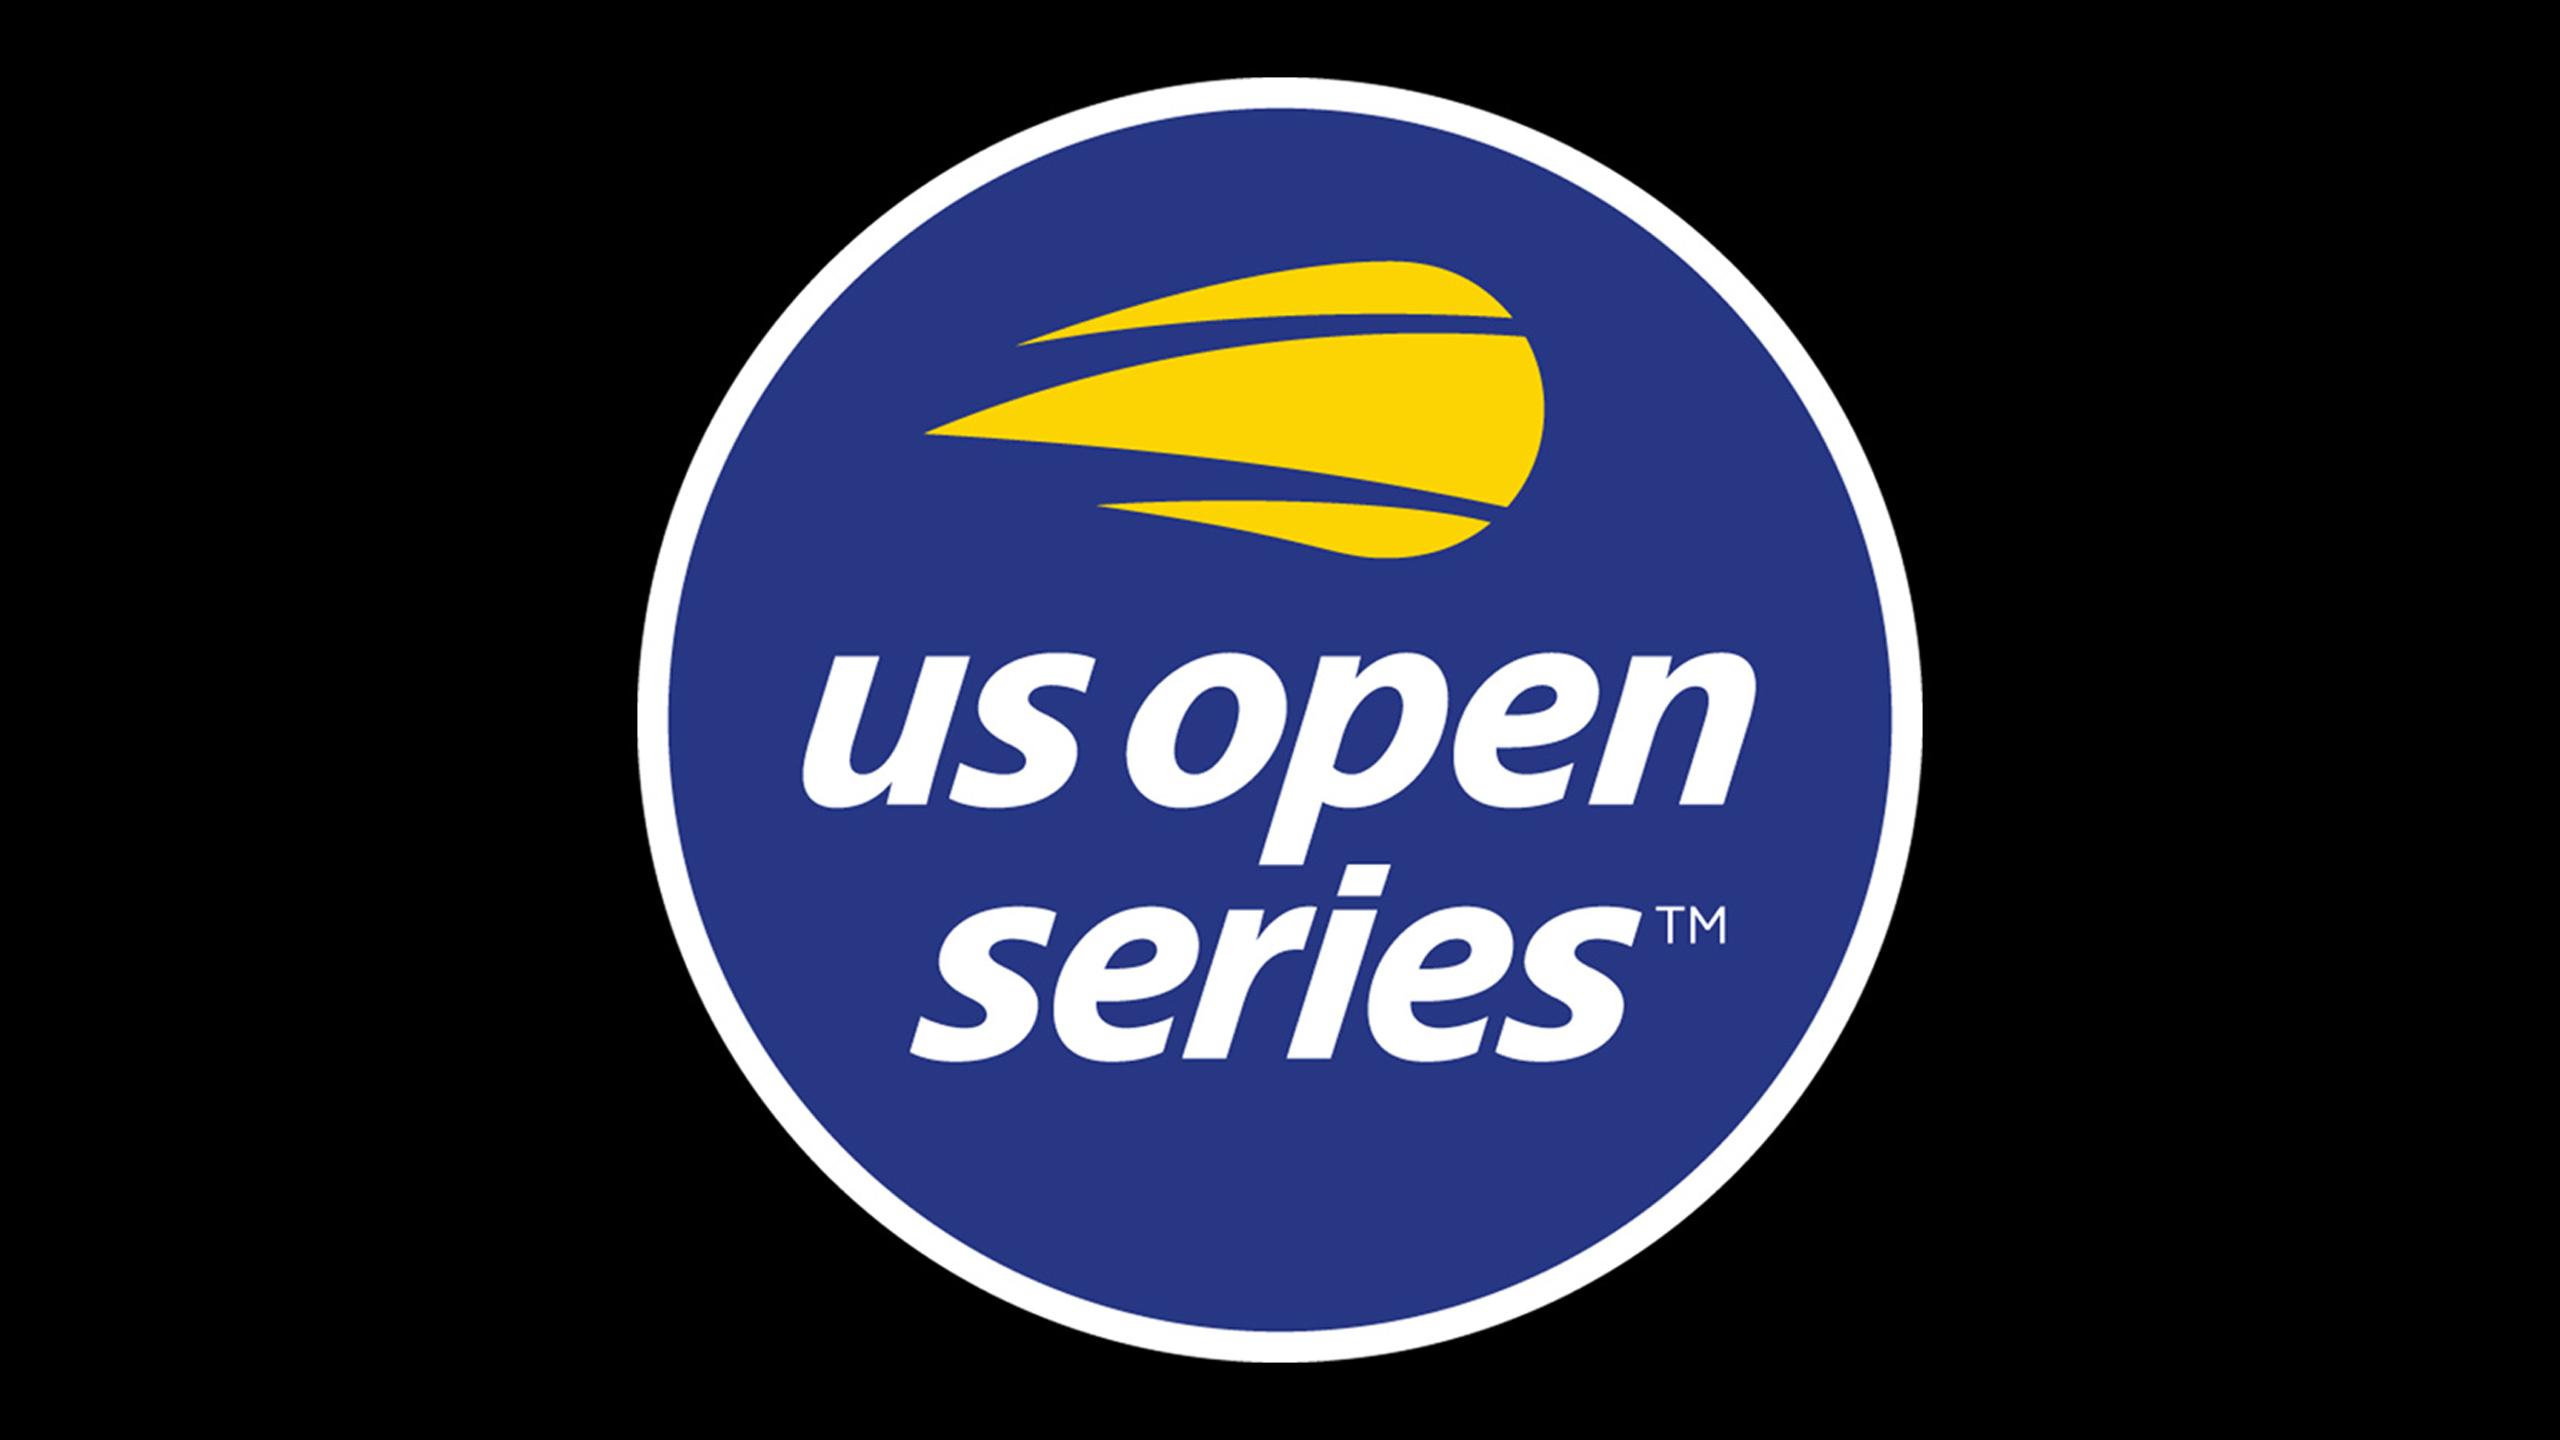 2018 US Open Series - BB&T Atlanta Open (First Round)